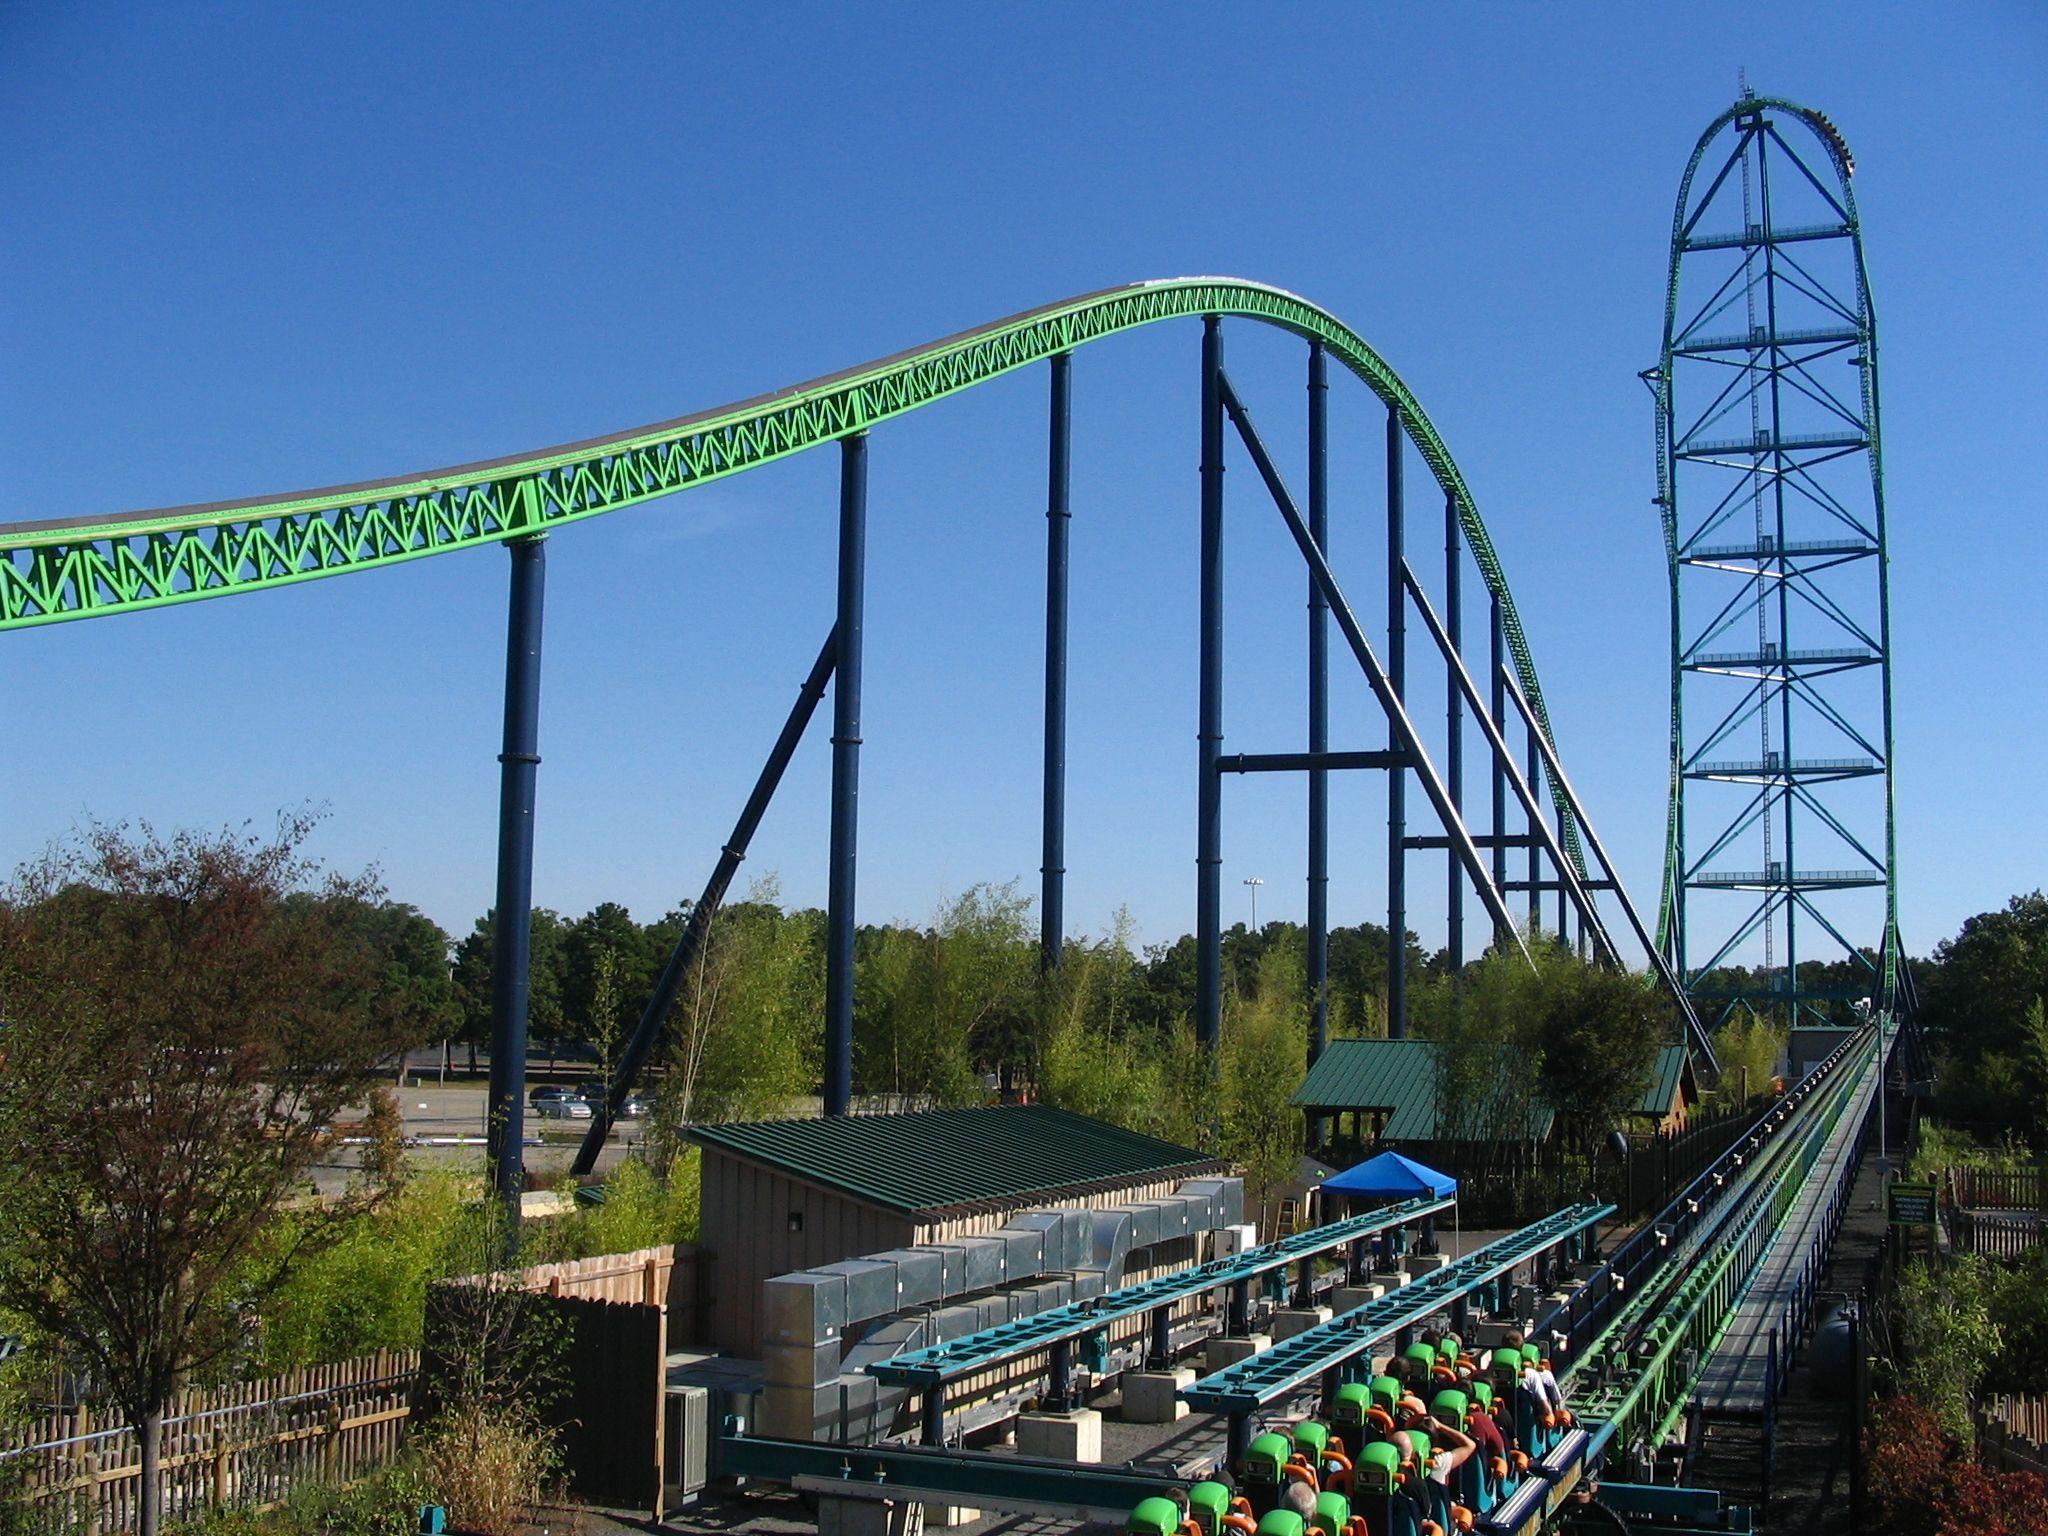 Kingda Ka Google Images Kingda Ka Six Flags Great Adventure Best Roller Coasters